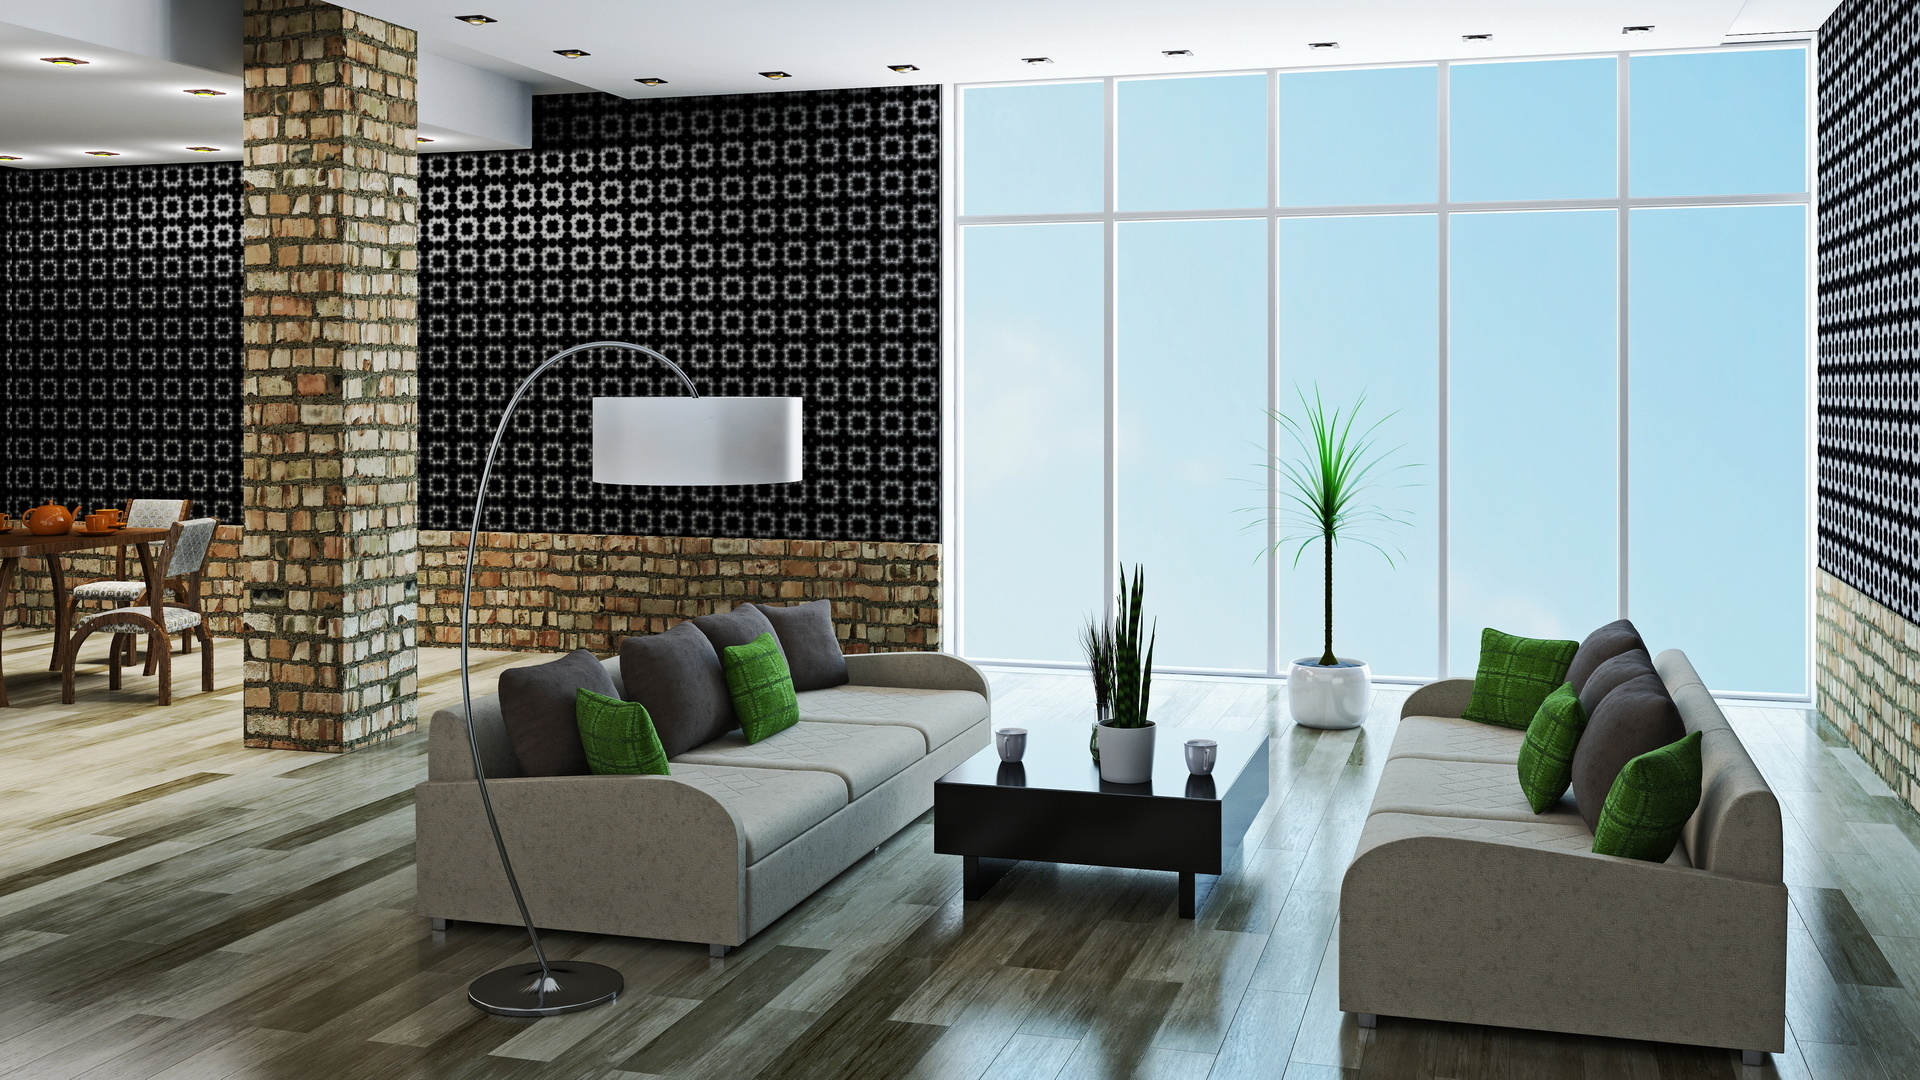 Real Estate News & Home Tips